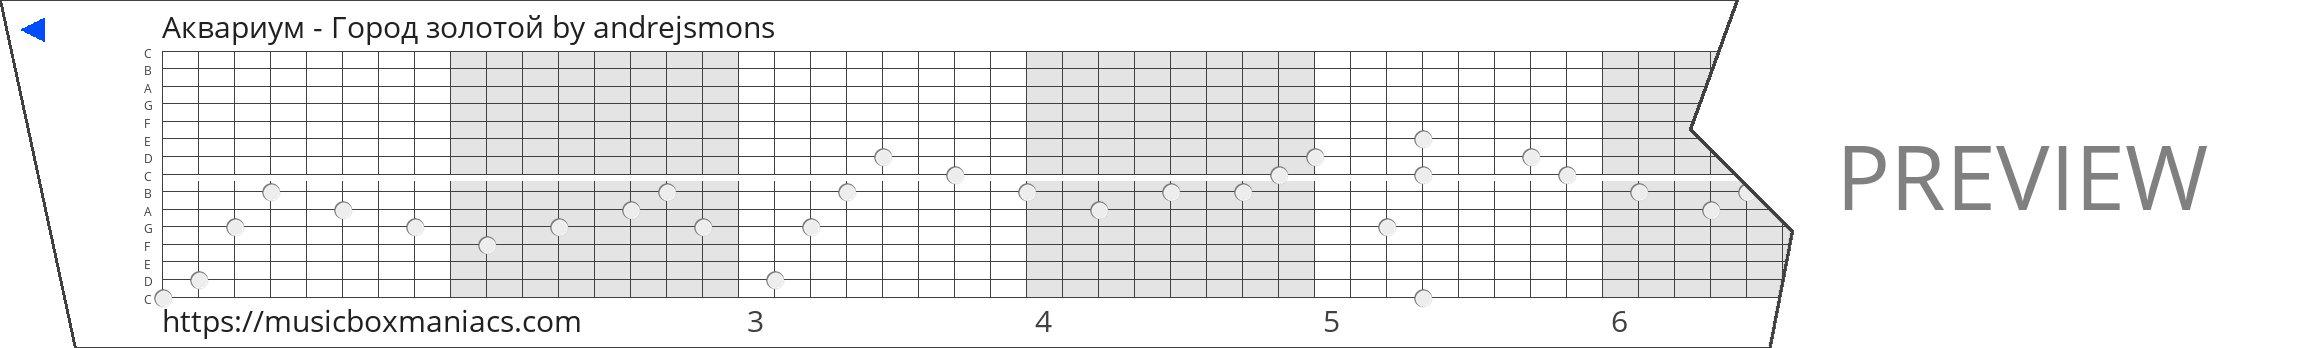 Аквариум - Город золотой 15 note music box paper strip